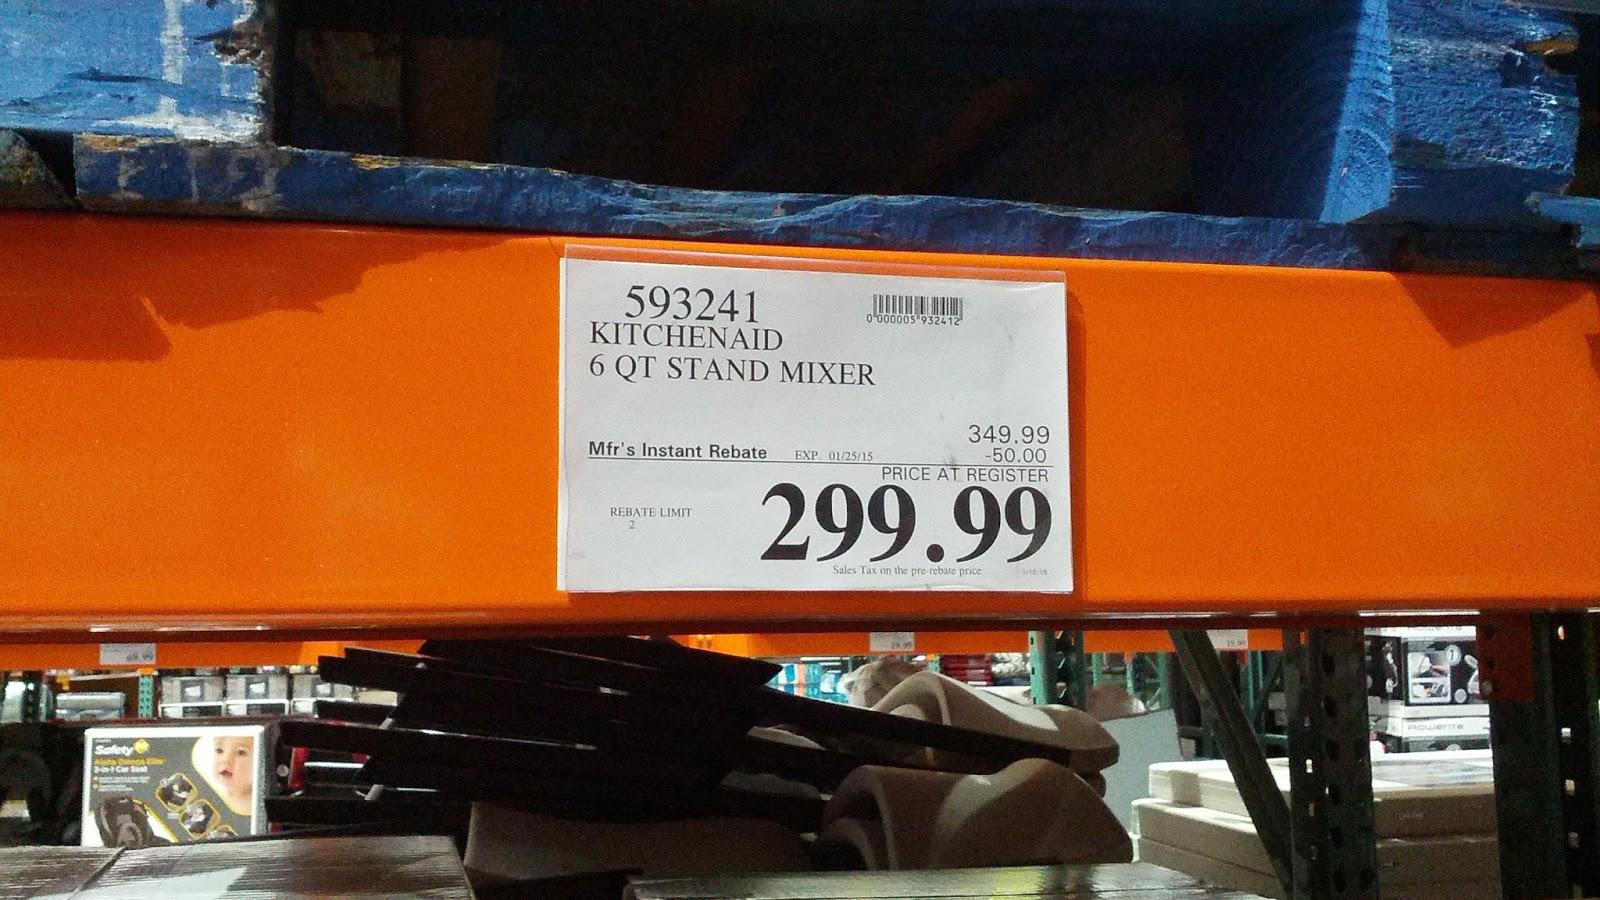 Exellent Kitchenaid Professional 600 Costco Kitchenaid Mixer Pictures  Professional On Image Kitchenaid Professional 600 Costco